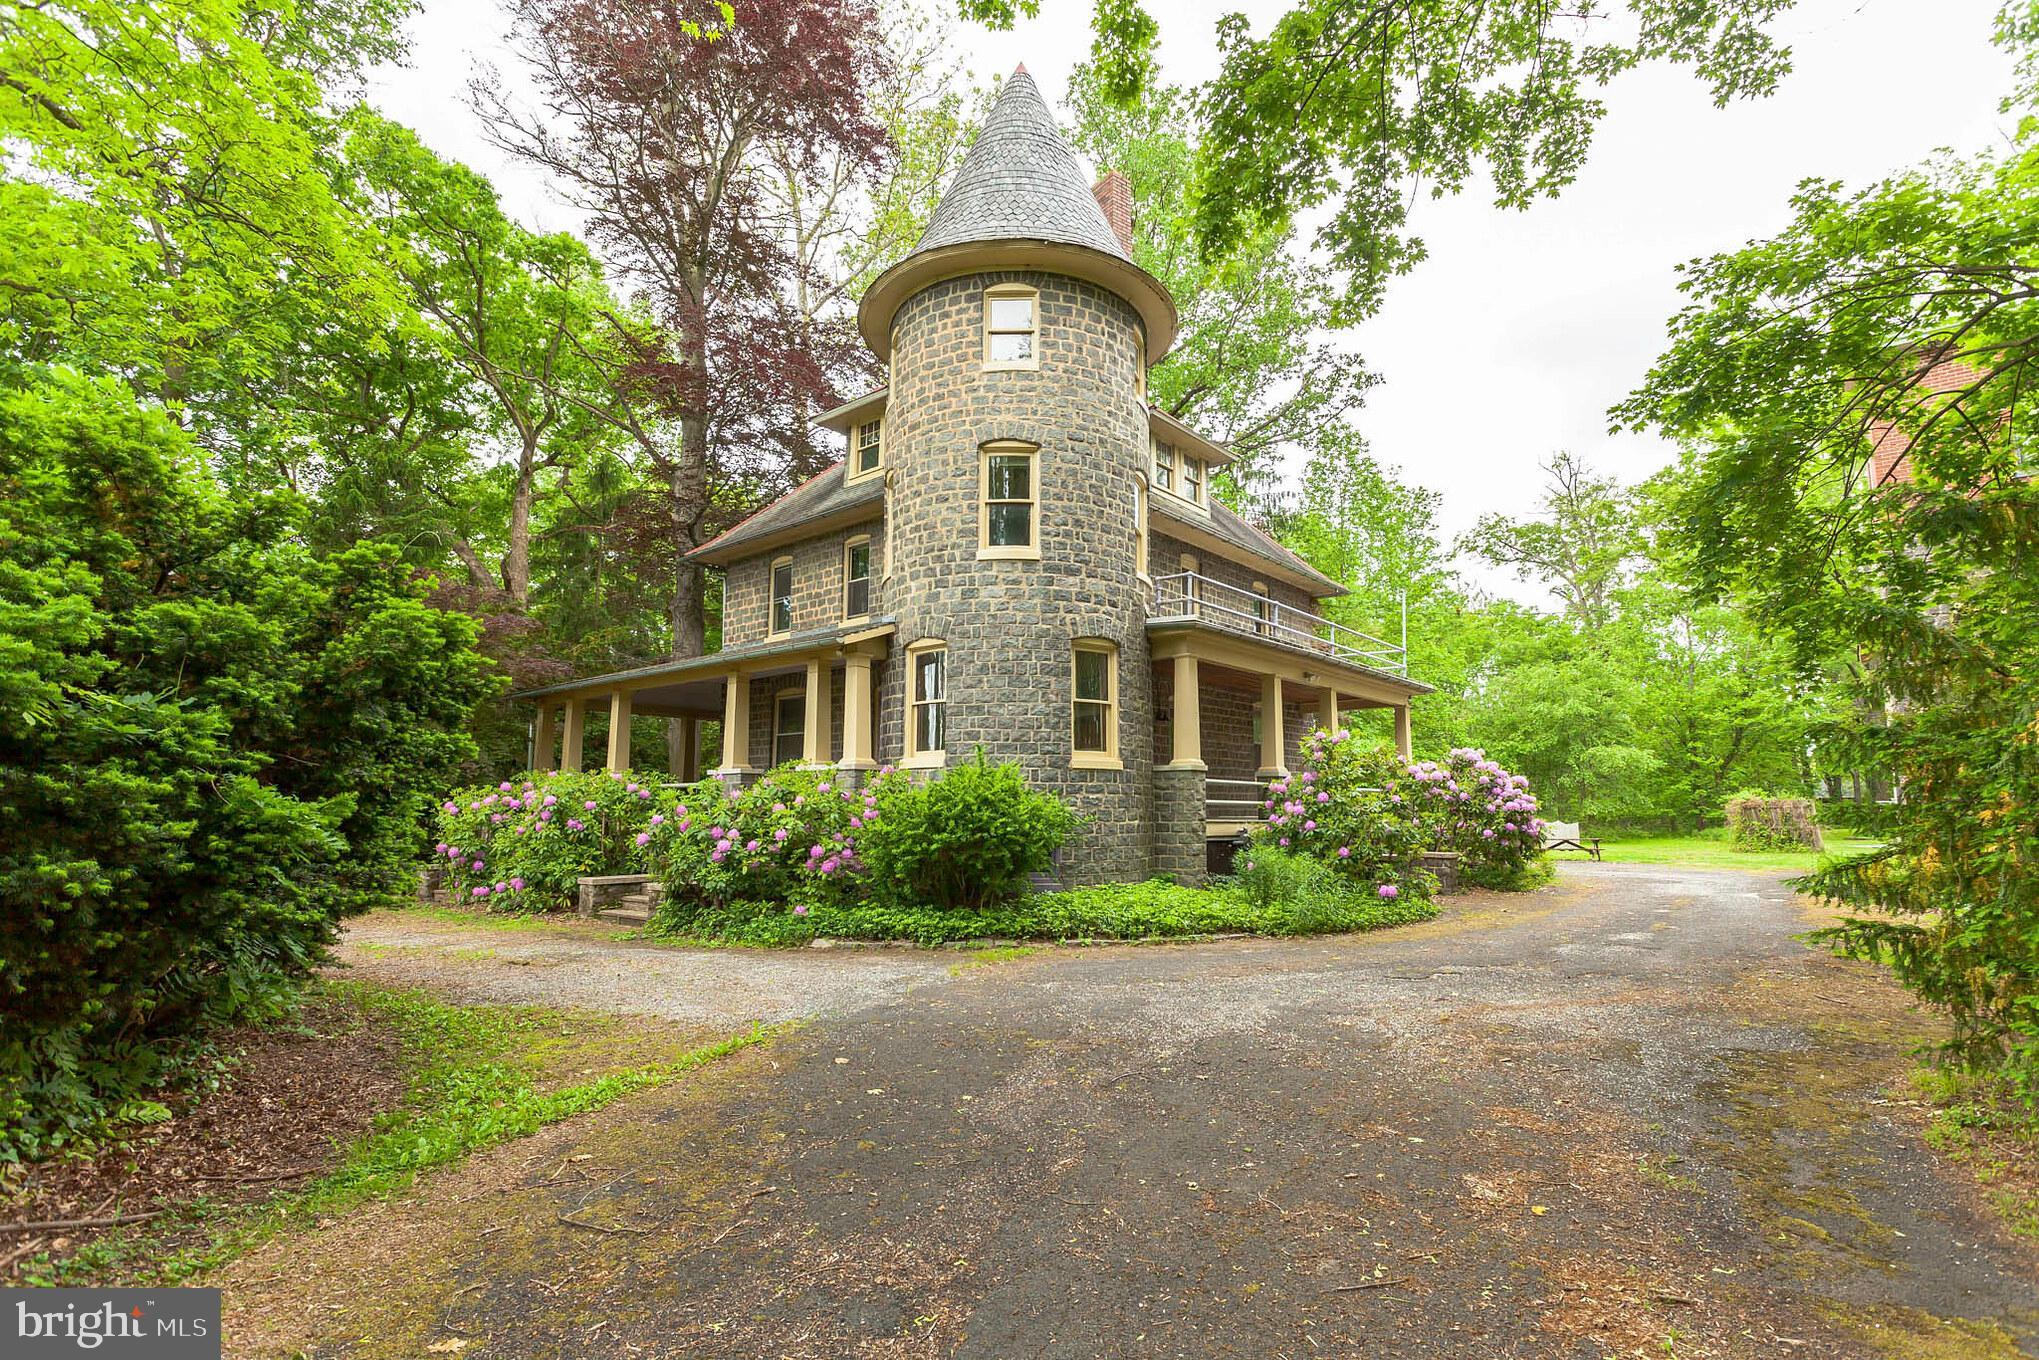 840 W Orvilla Road, Hatfield, PA 19440